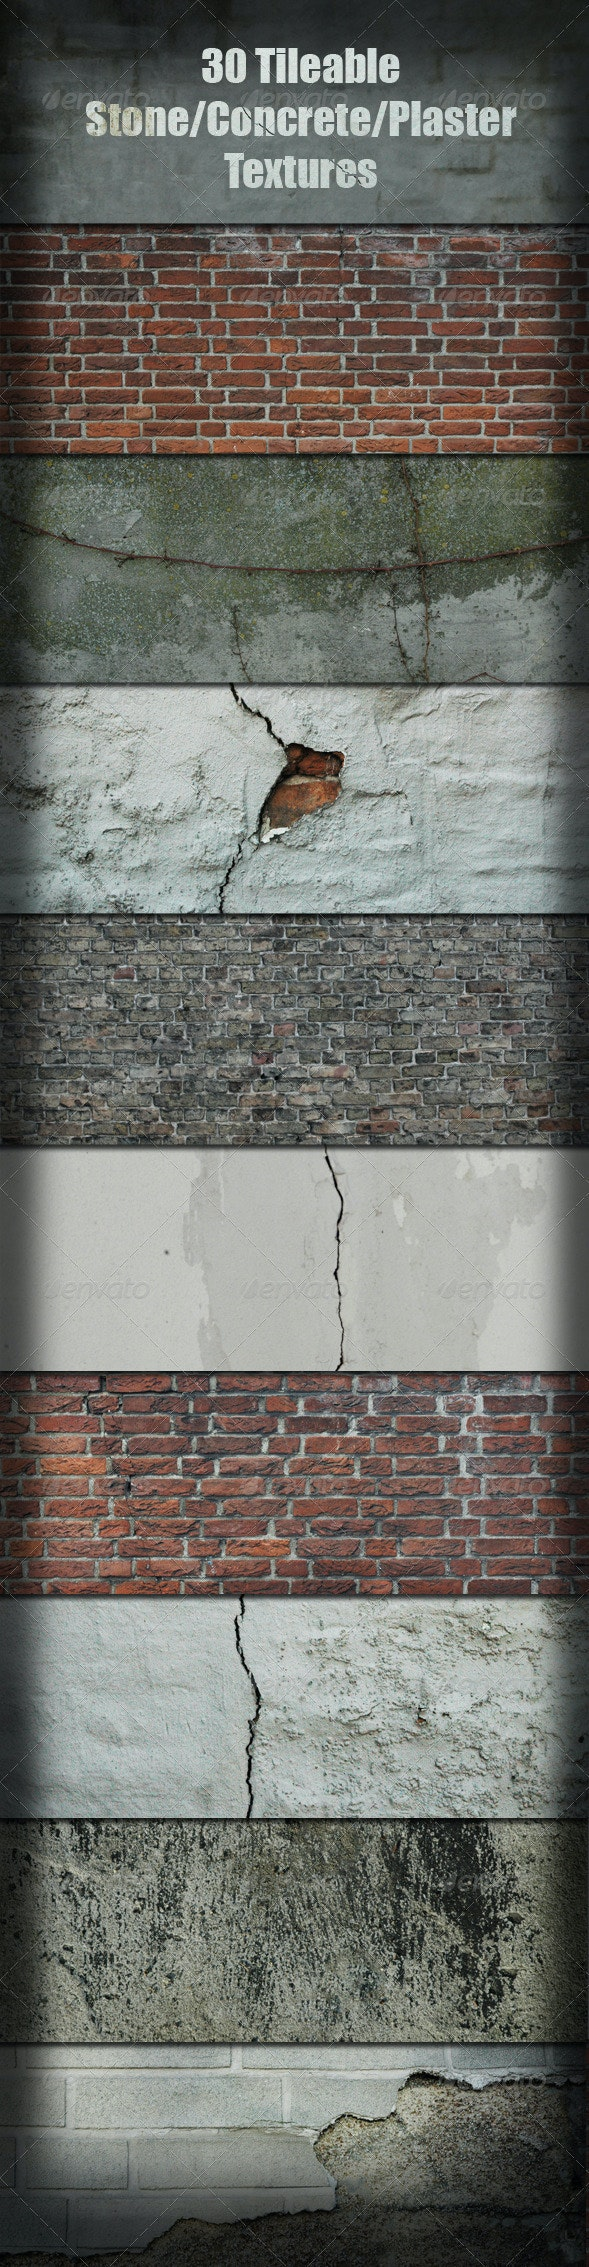 30 Tileable Stone/Concrete/Plaster Textures  - Industrial / Grunge Textures